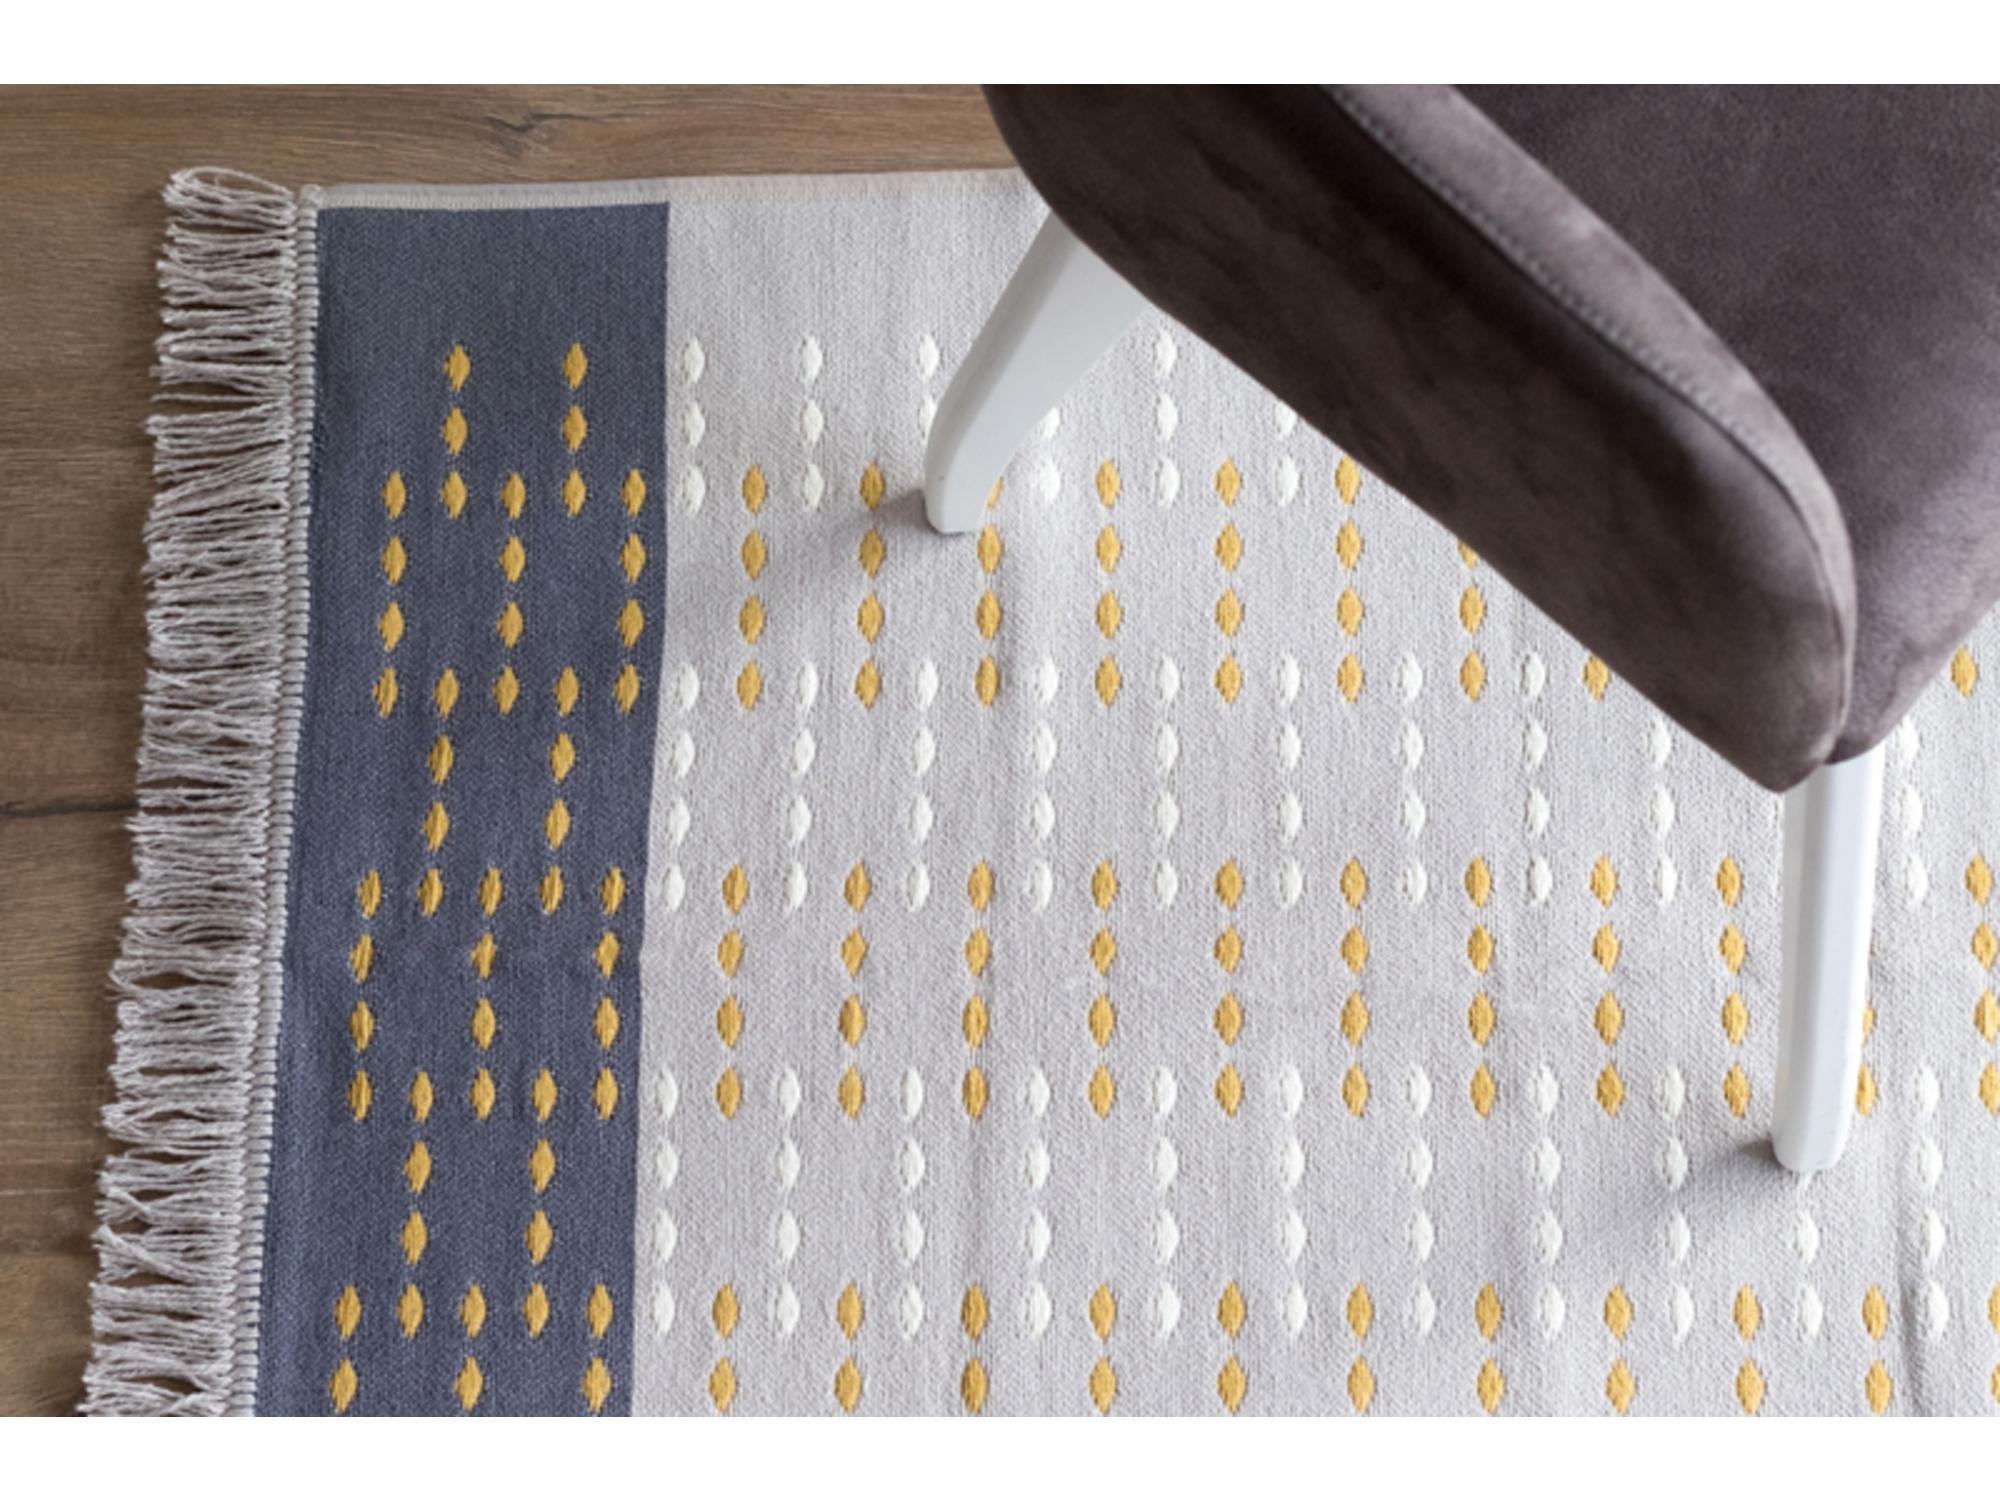 DekorDom Tepih Stella 60x90cm - Sp-Klm 163 B - Beige Mustard